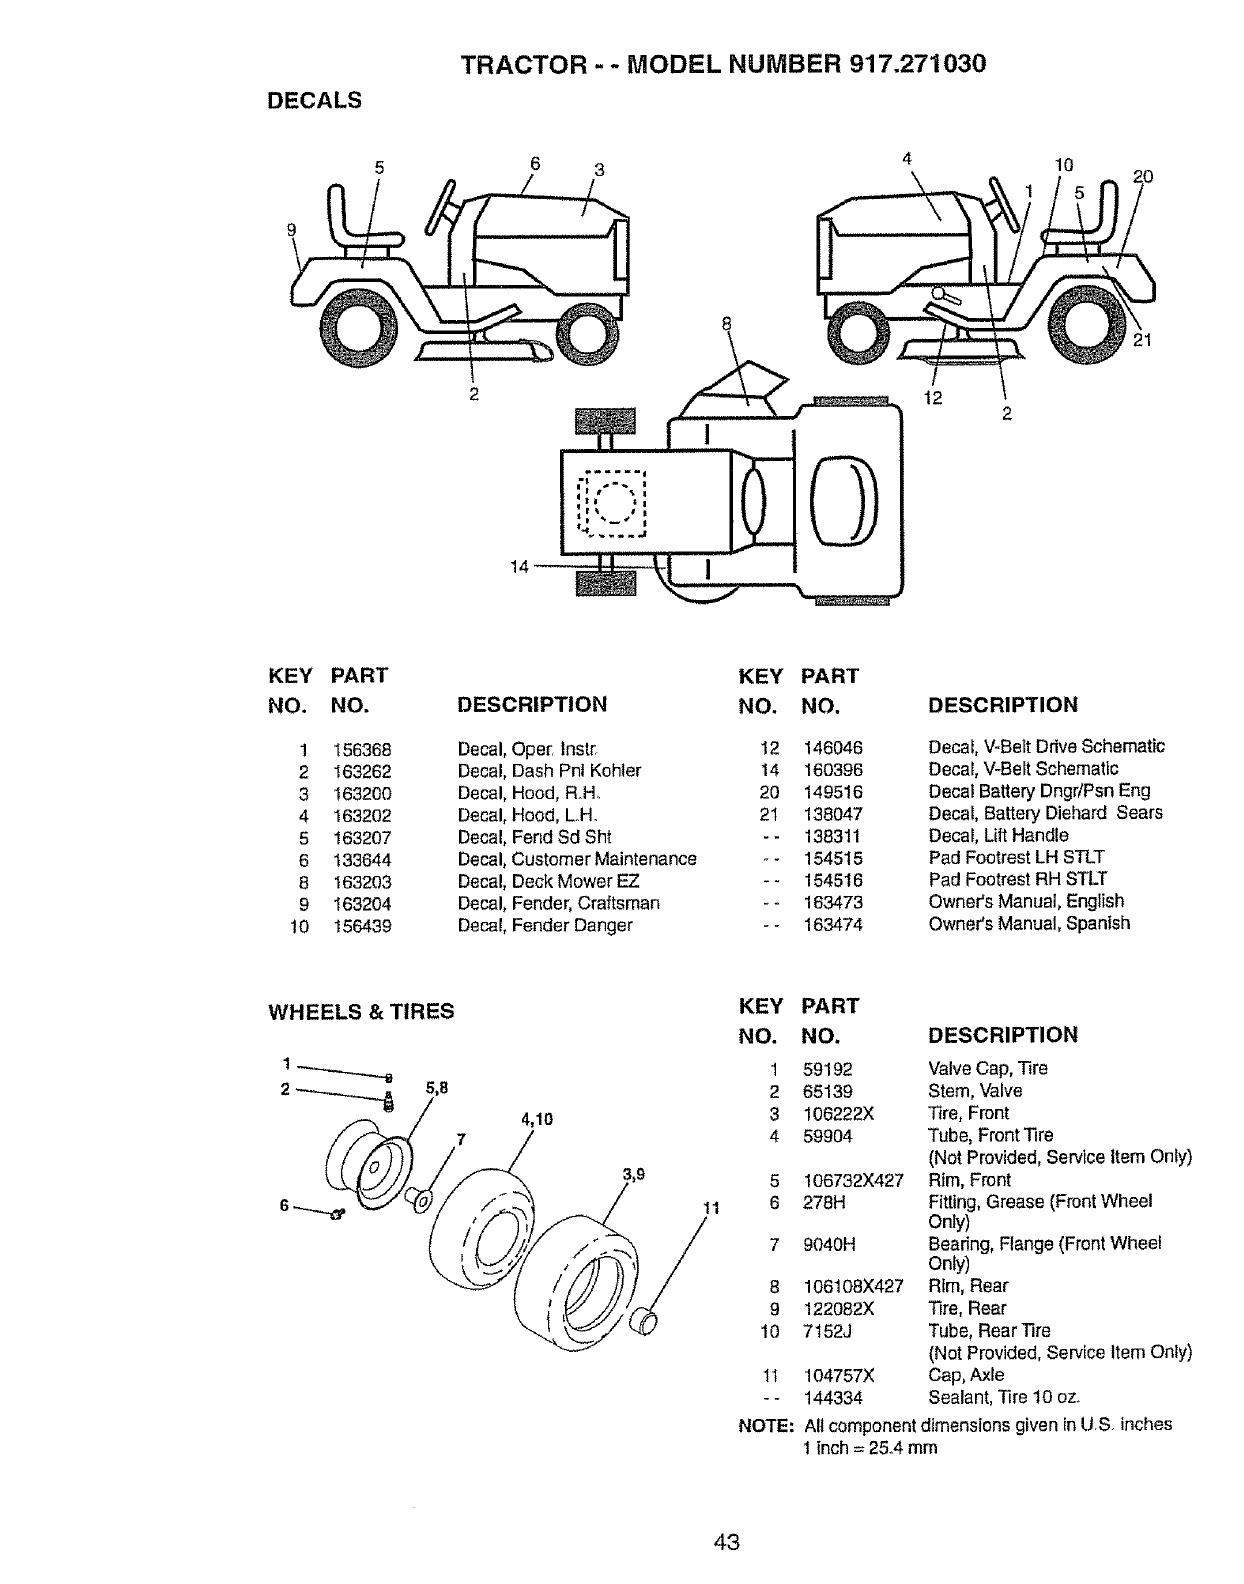 Craftsman 917.27103 TRACTOR-- MODEL NUMBER 917.271030